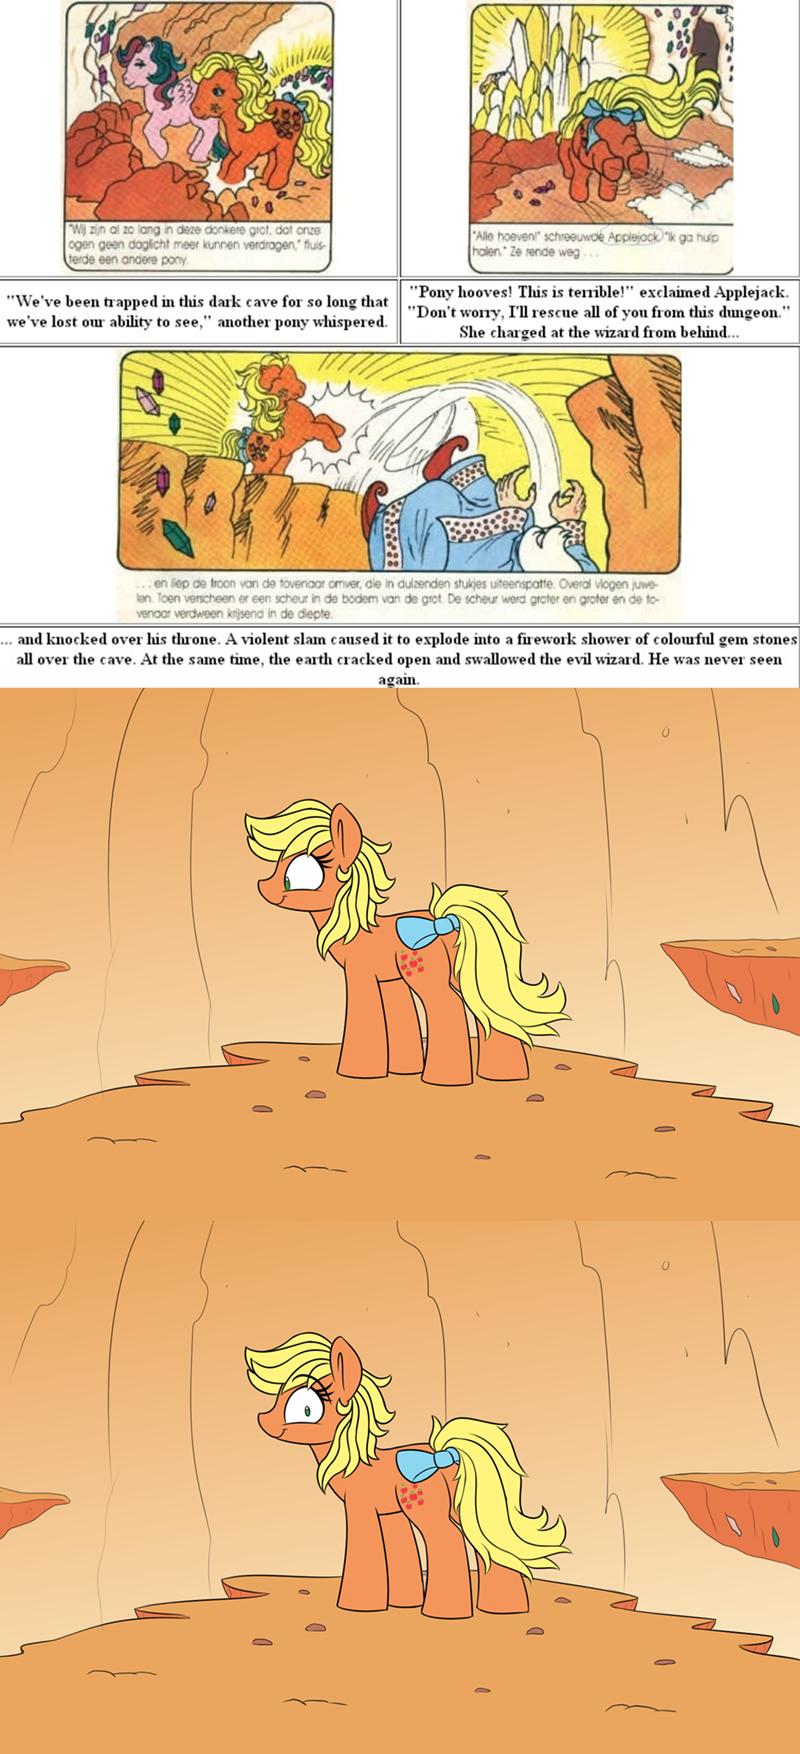 applejack applejack's amazing adventure g1 comic heir of rick - 9180477952